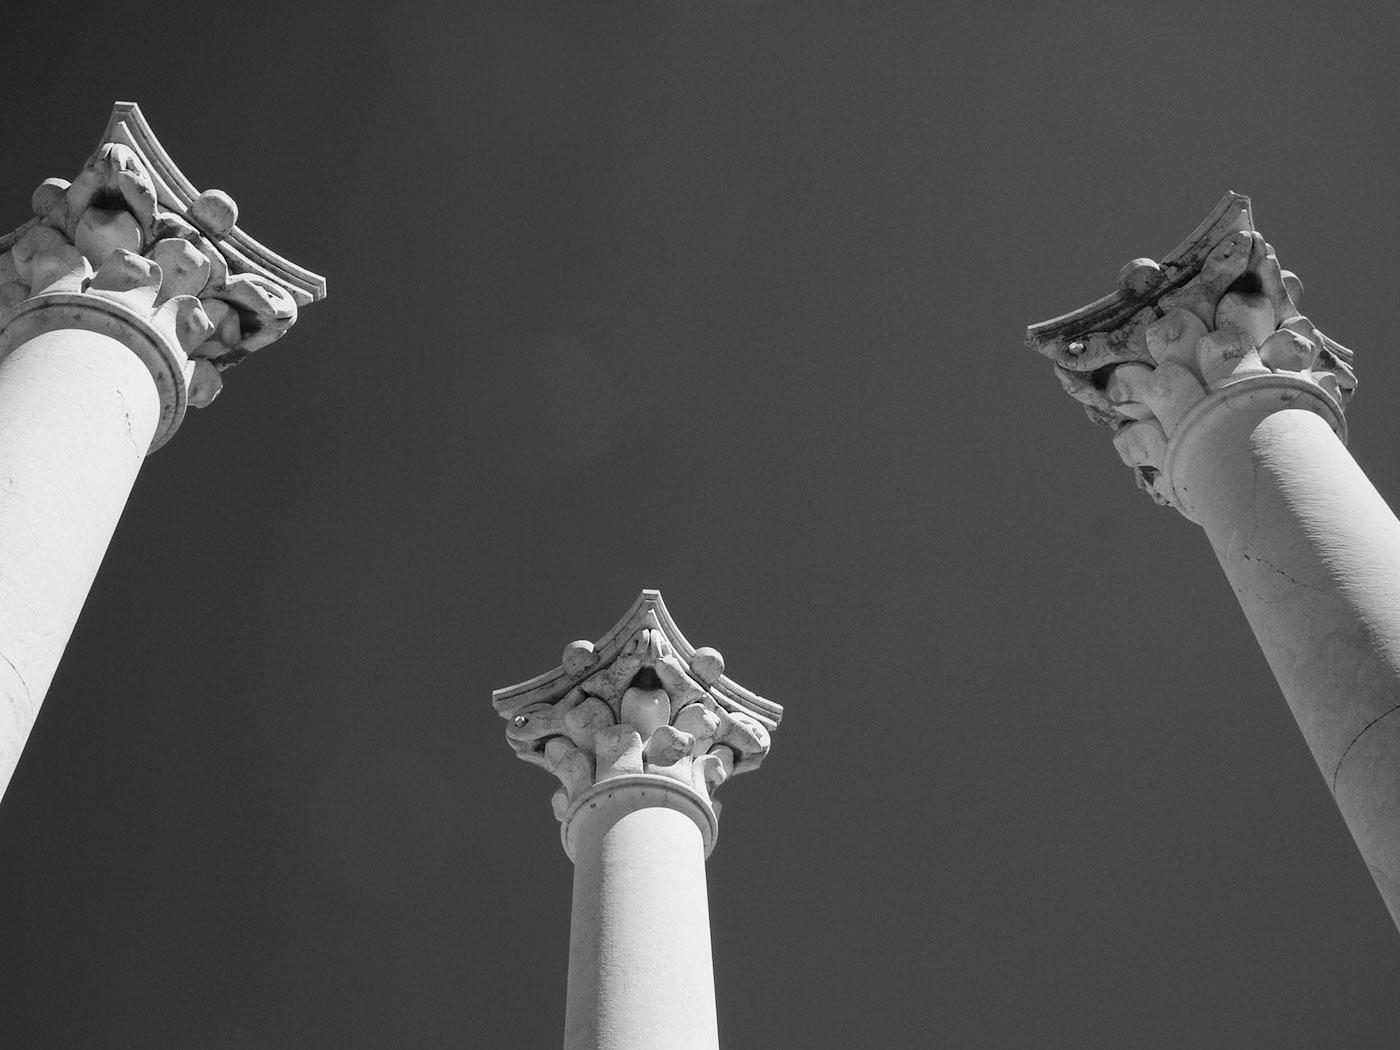 Temple pillars in Greece